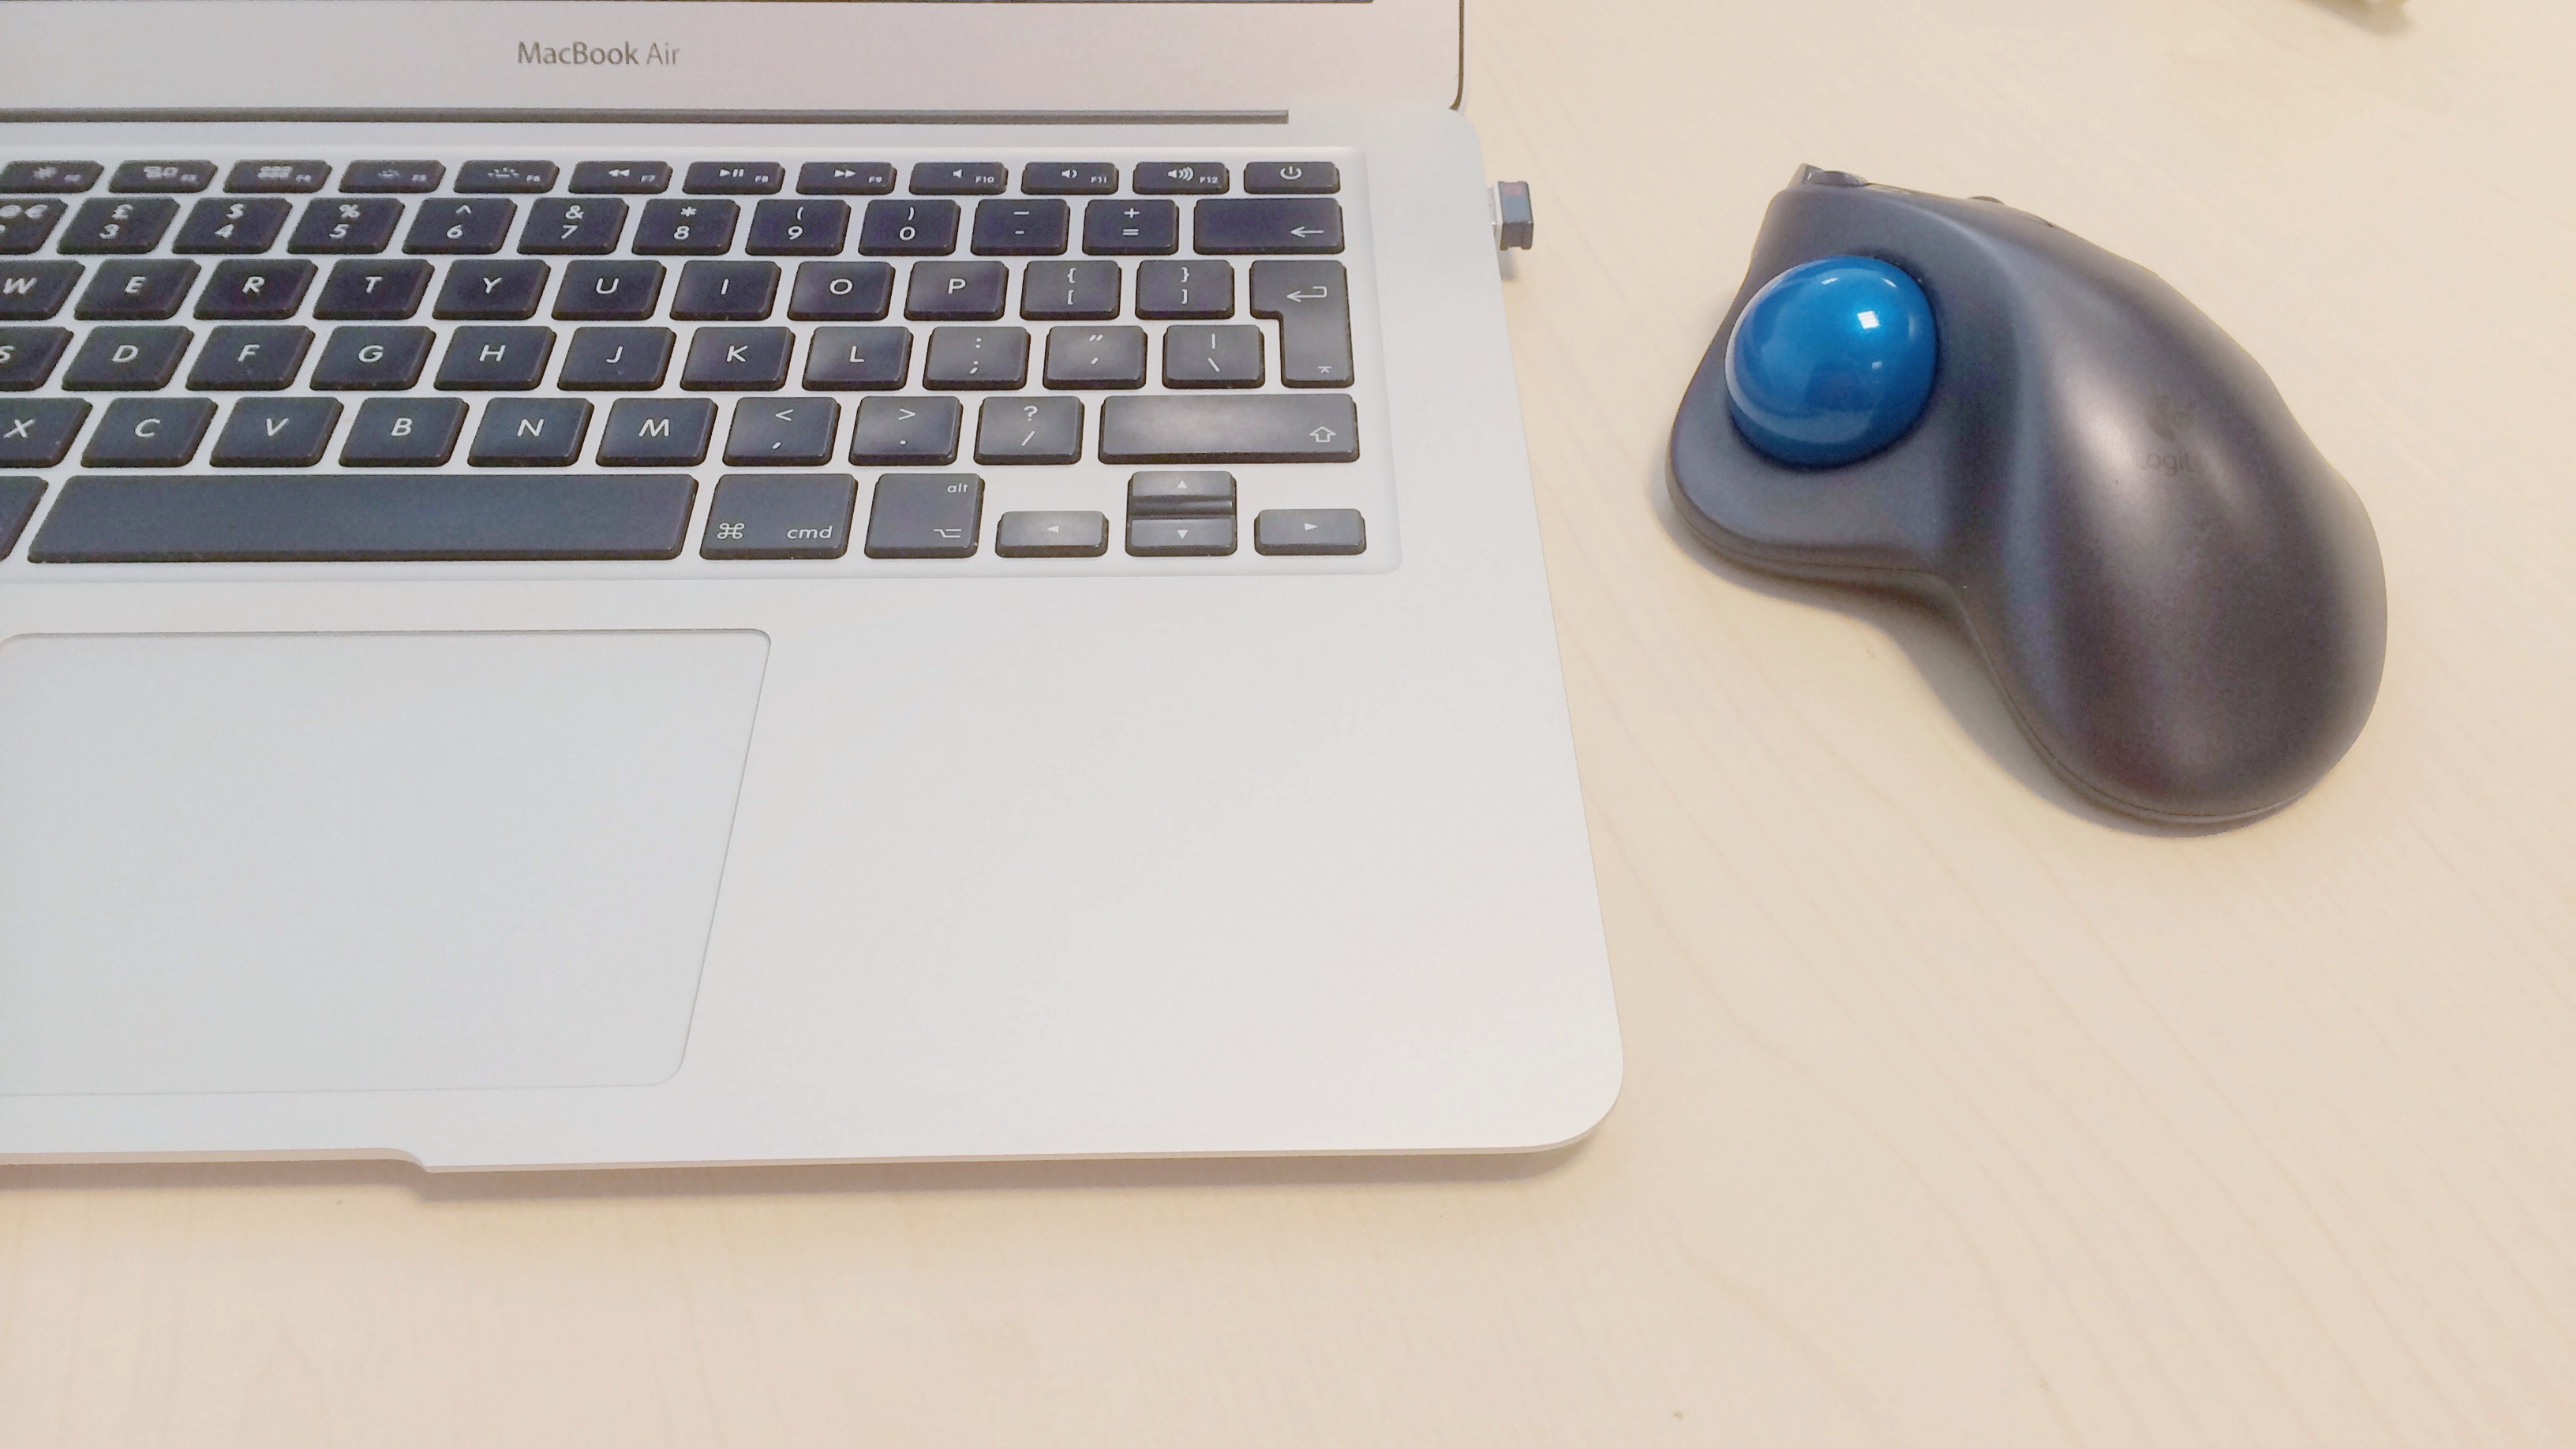 Keyboard and trackball